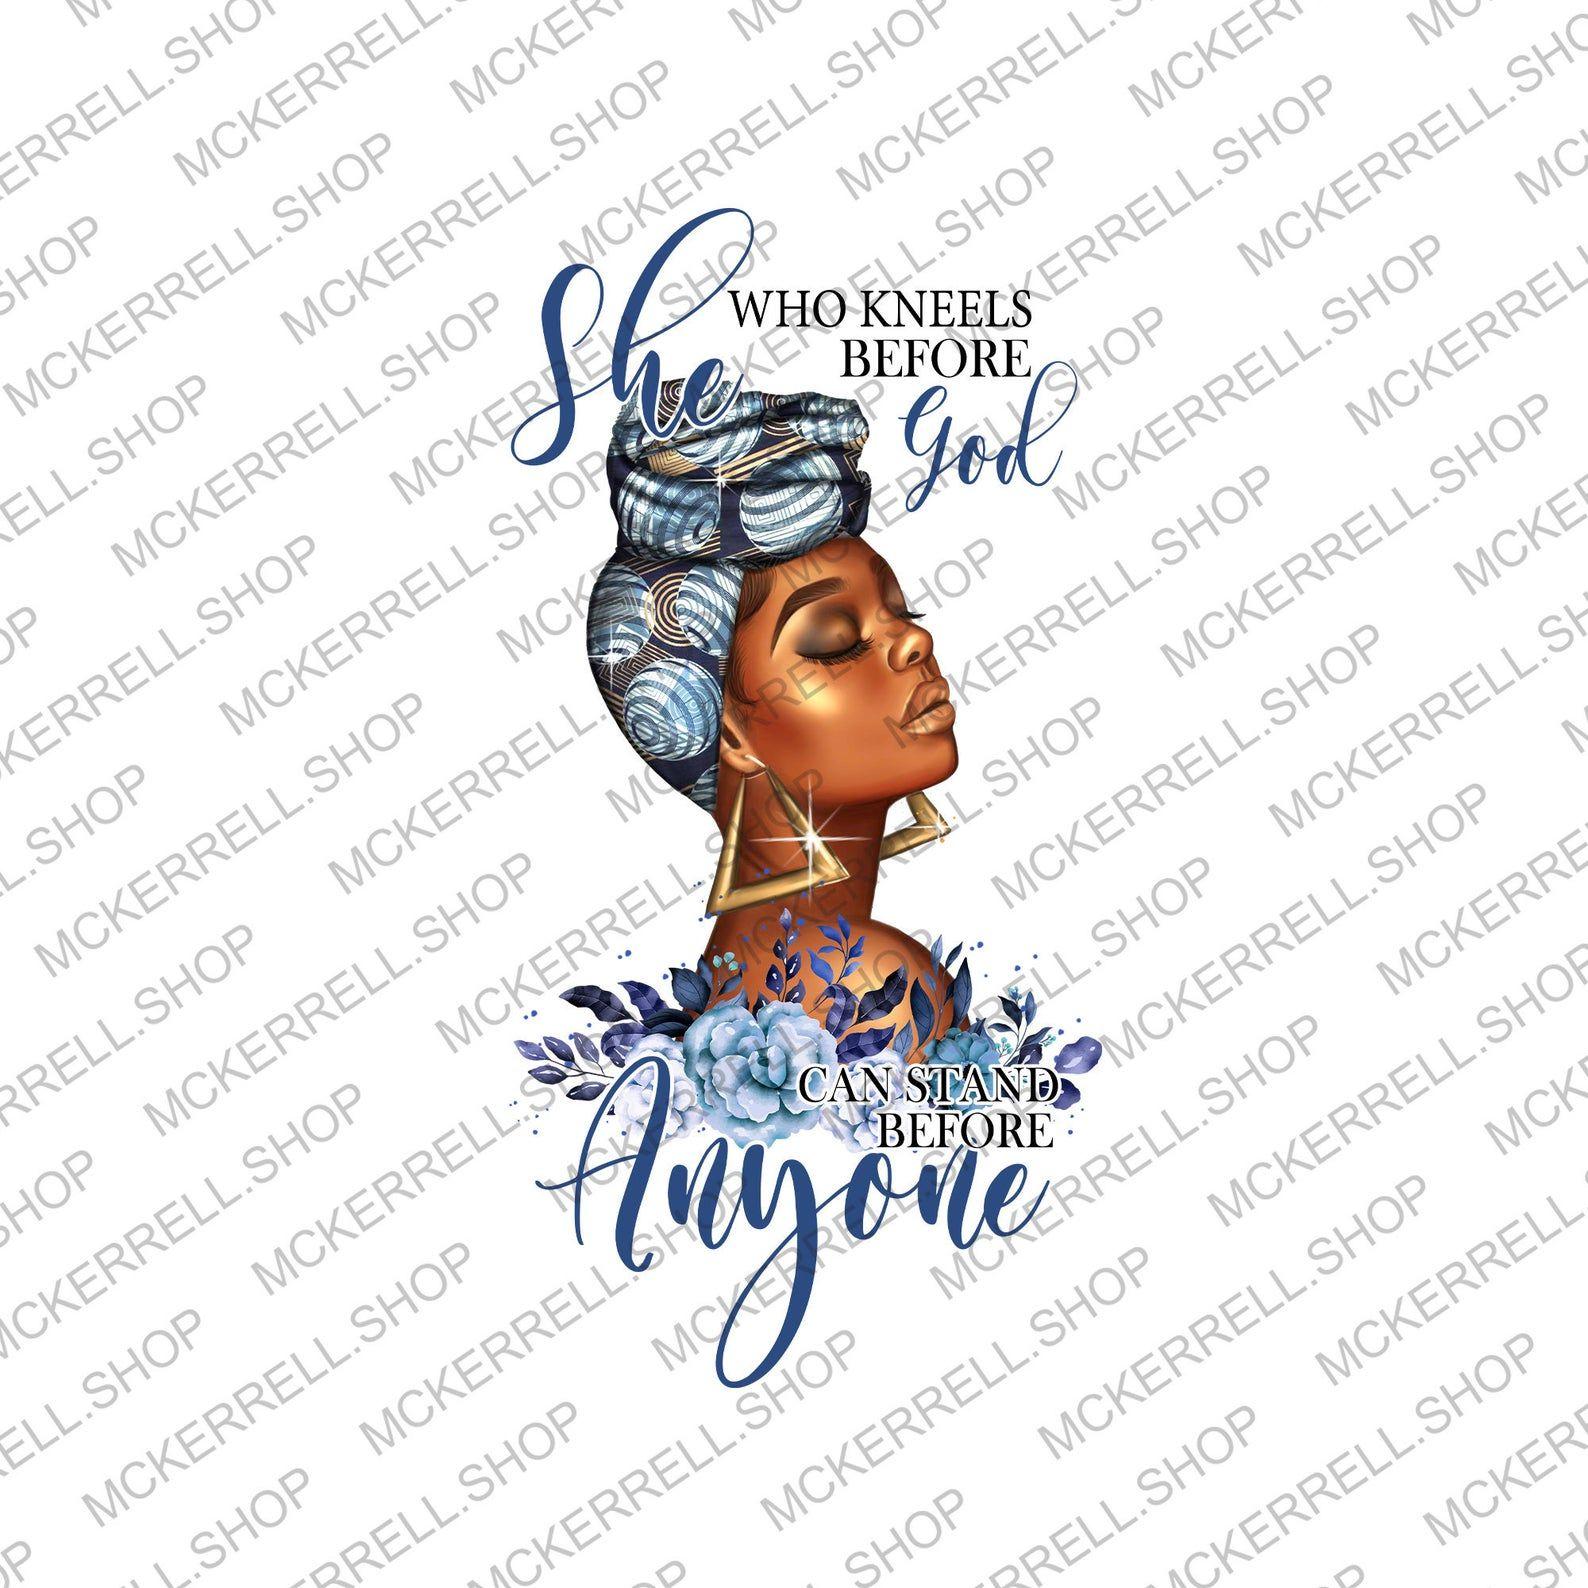 She Who Kneels Before God Can Stand Anyone Black Women Png Christian Png Melanin Png Black Pride Png African Women Black Queen Png In 2021 Black Girl Magic Art Black Love